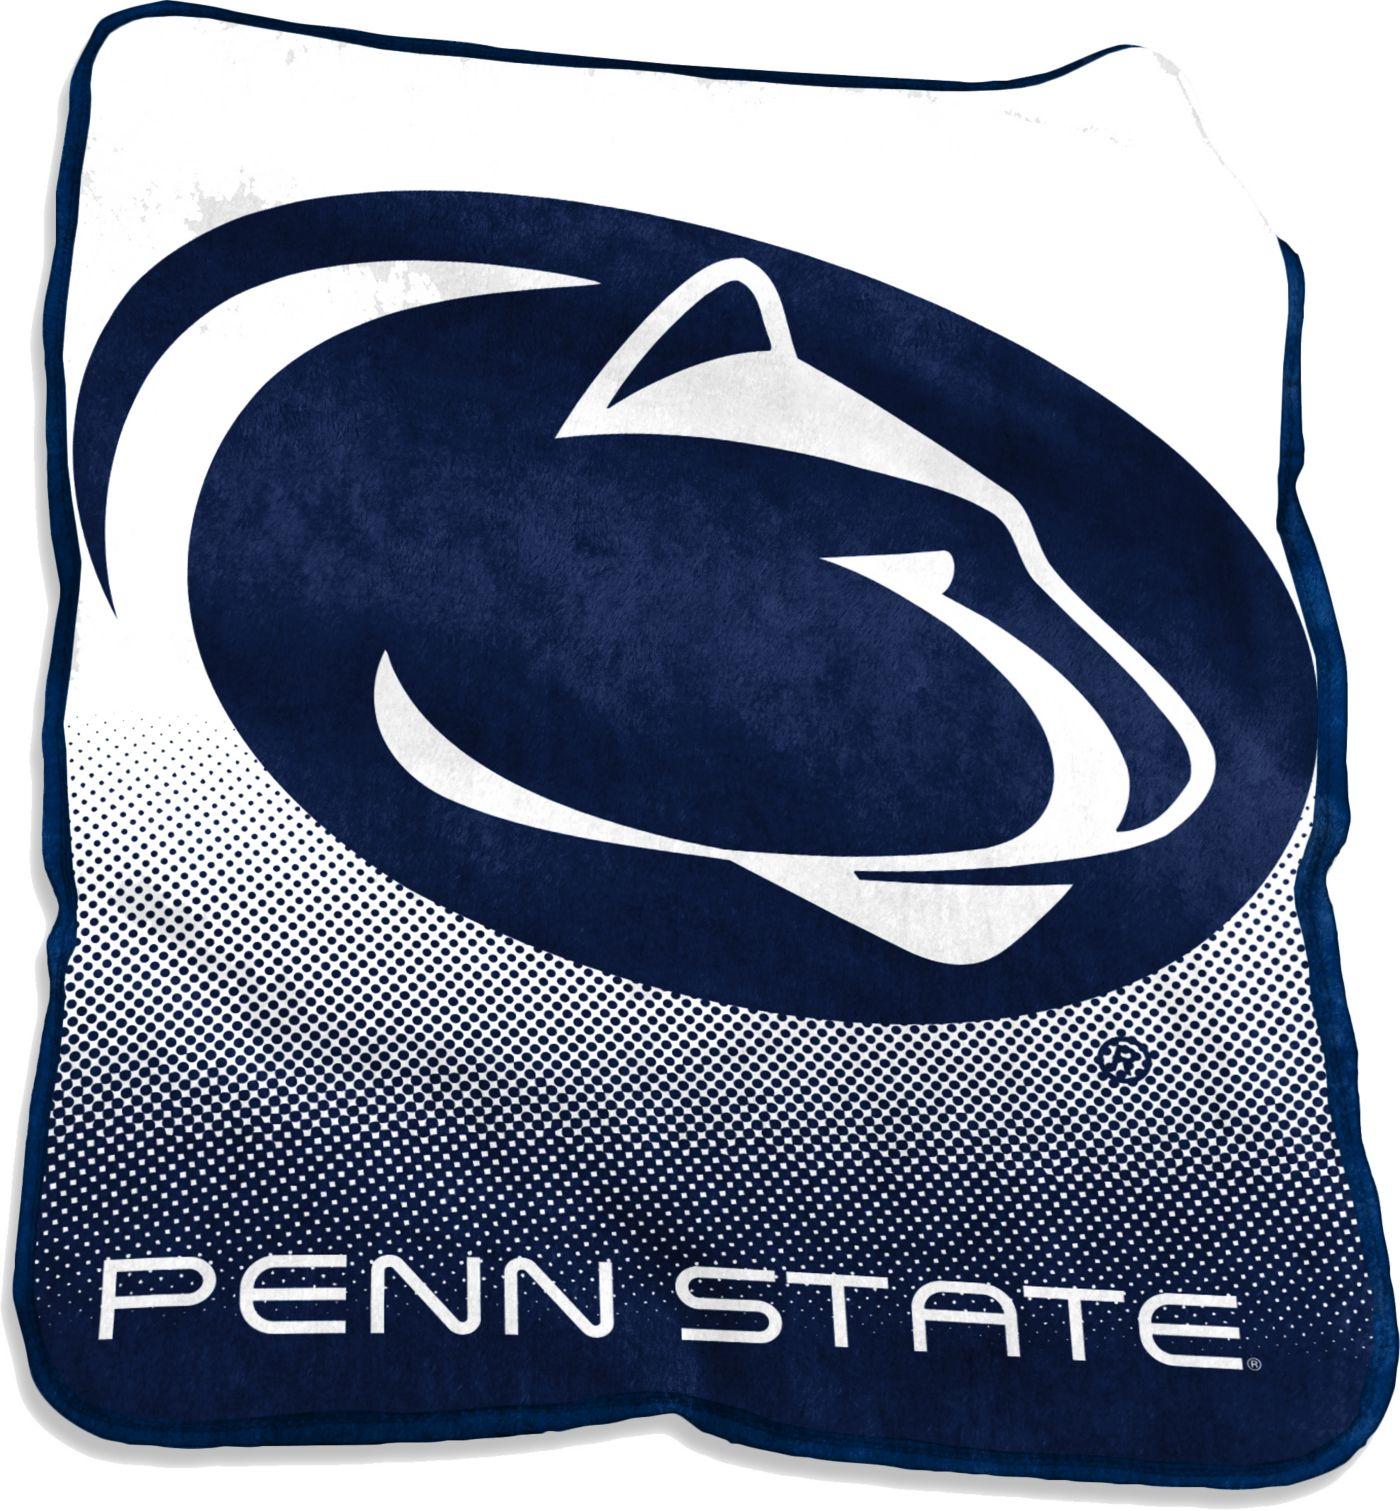 Penn State Nittany Lions Raschel Throw